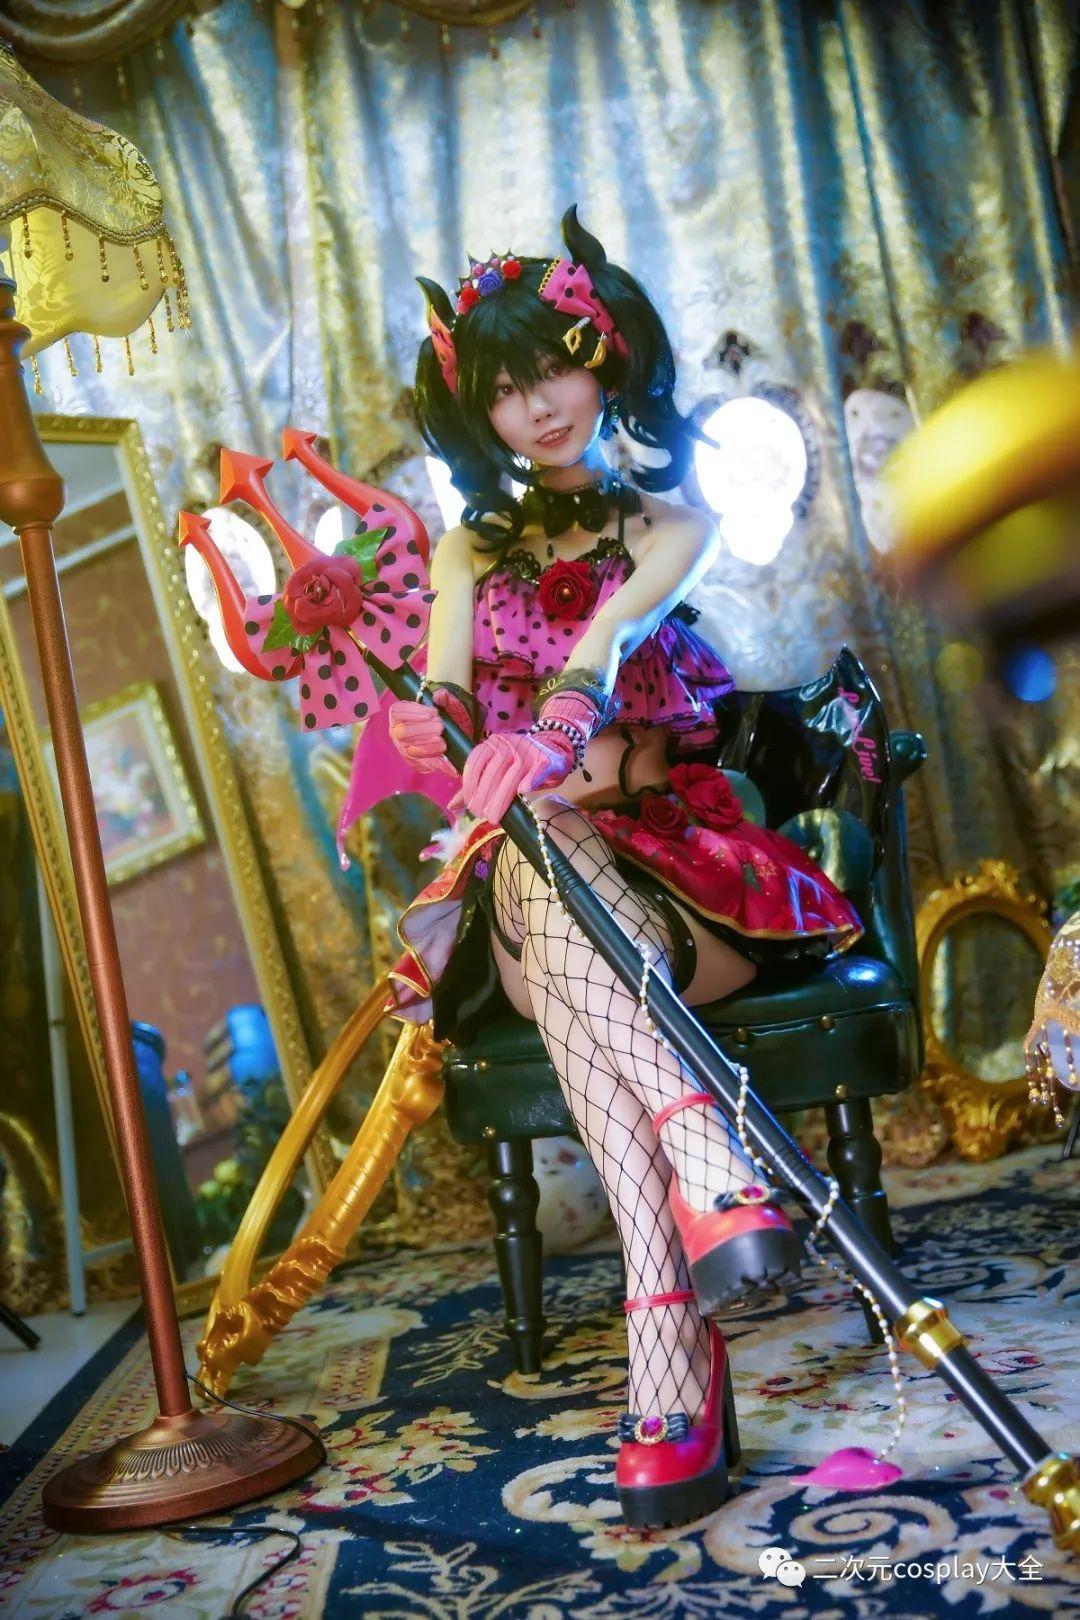 cosplay – 《lovelive!》小恶魔觉醒矢泽妮可,第一秒以为是可爱,然而被网格黑丝所吸引 - [leimu486.com] No.6